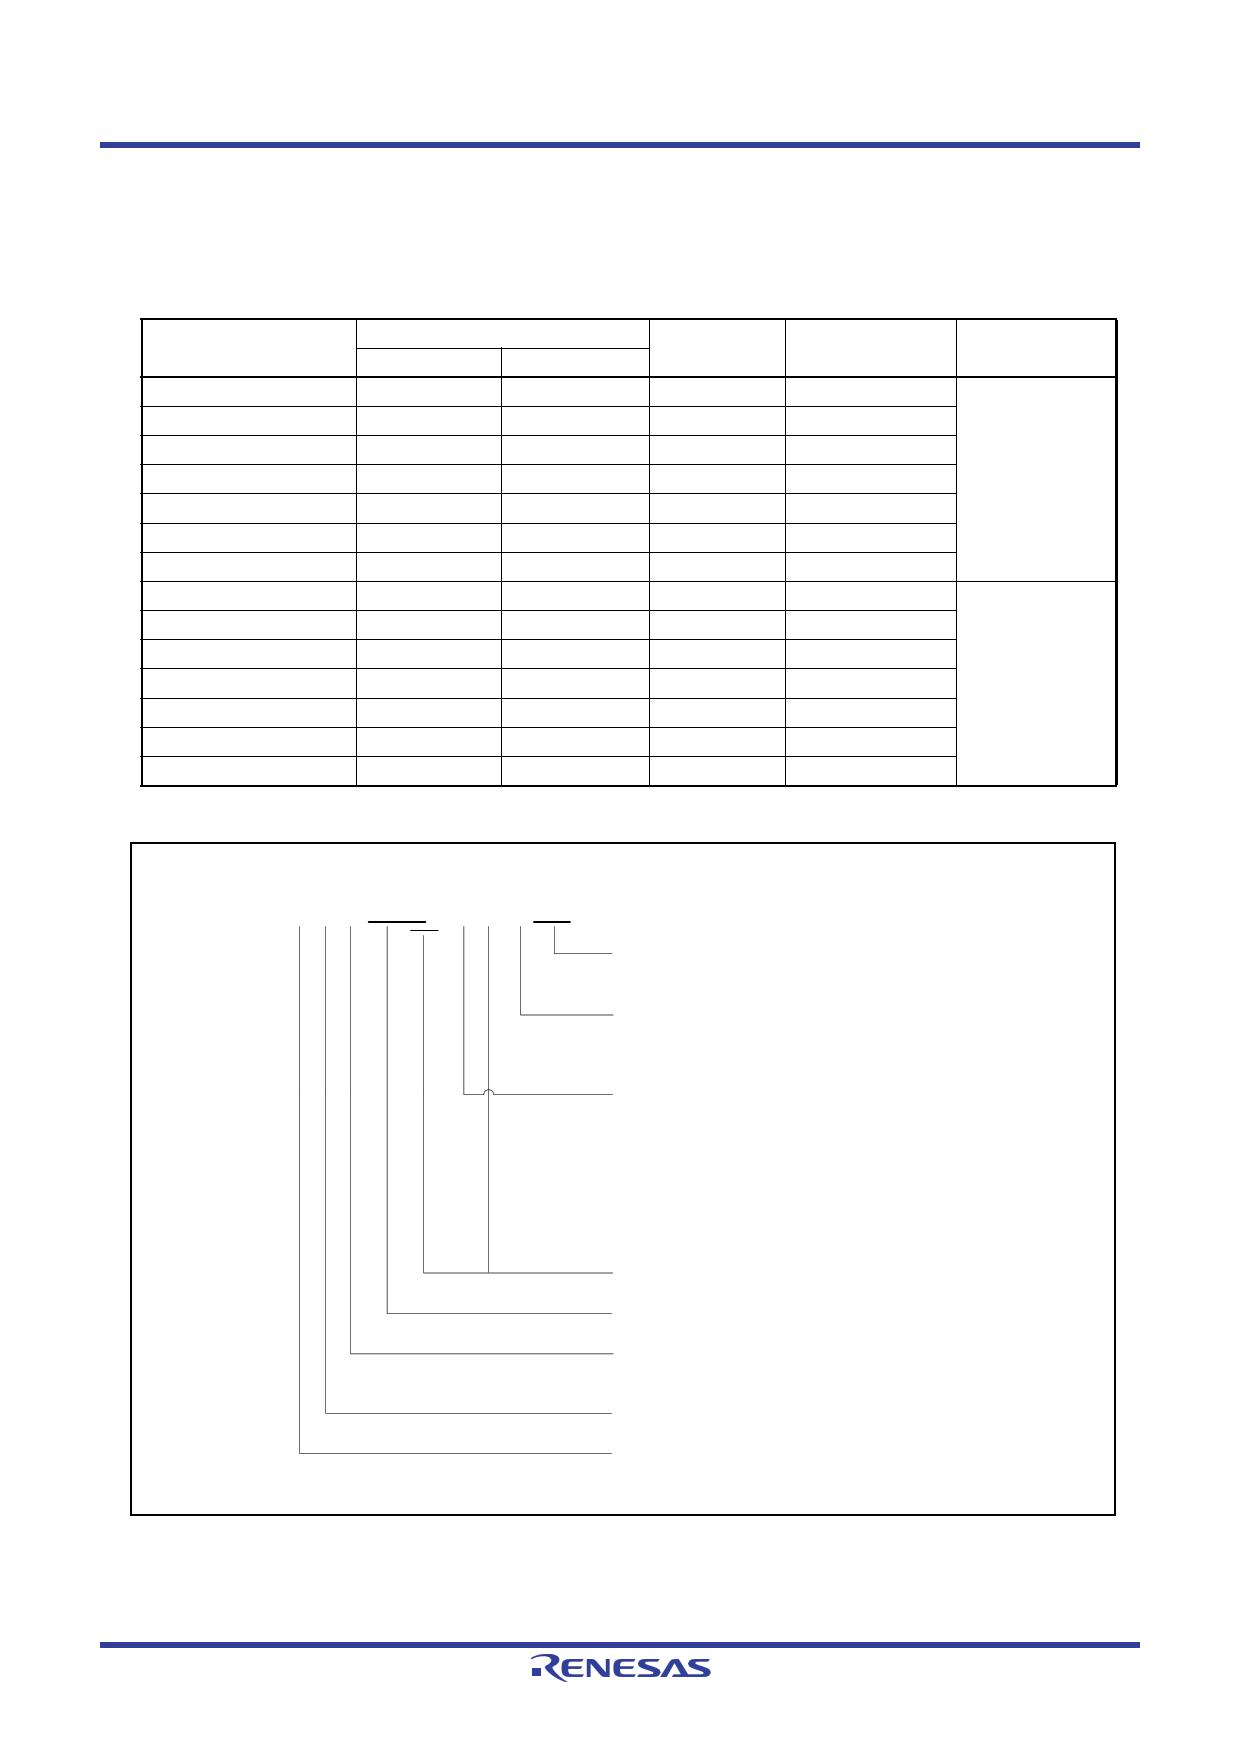 R5F2135CCDFP pdf, 반도체, 판매, 대치품